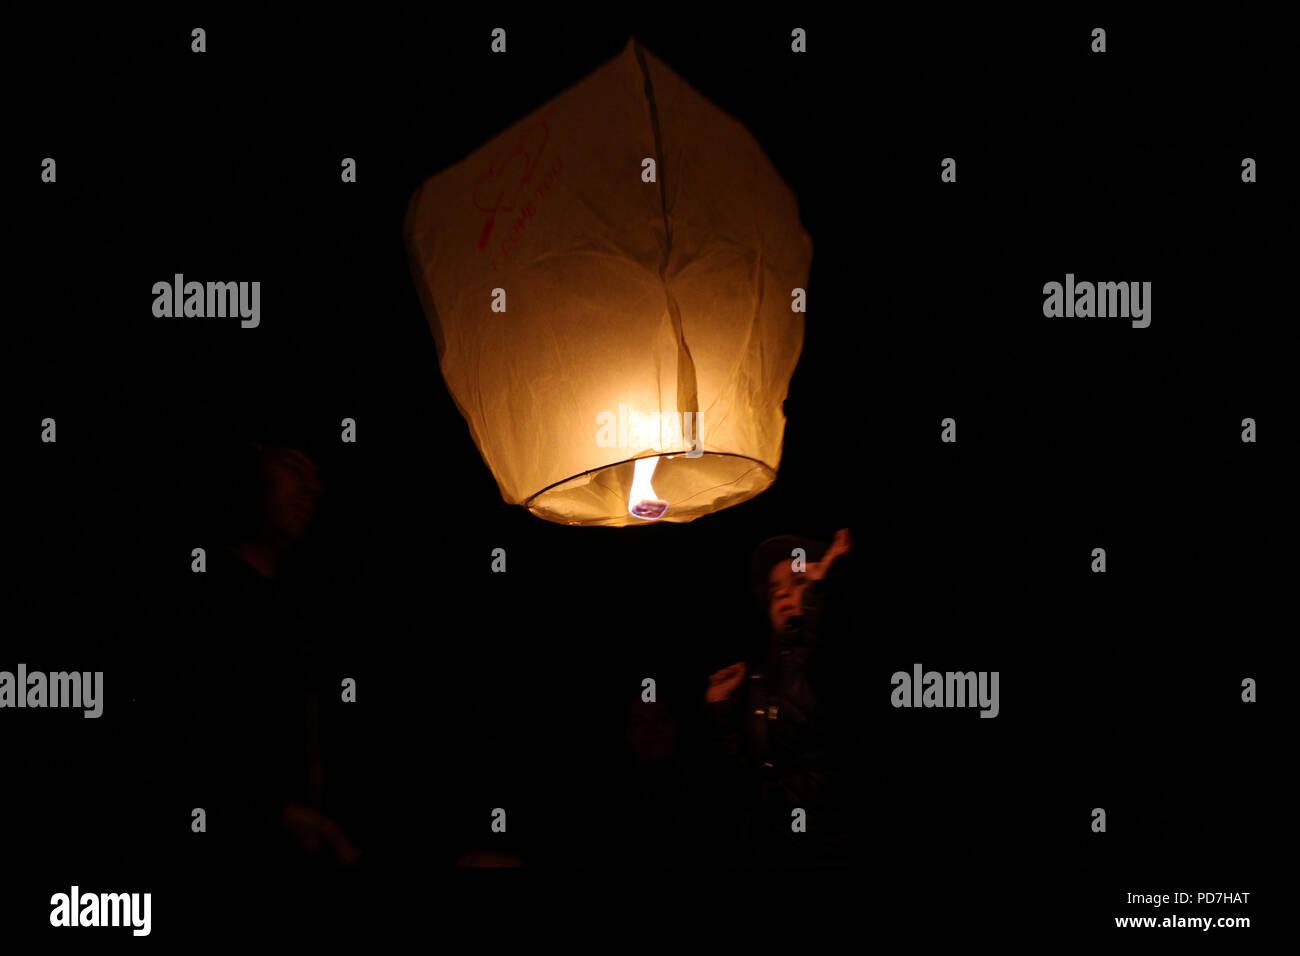 Sky Lanterns Floating In The Sky Deepavali Lights Festival Chinese Sky Lantern Wallpaper Diwali Celebration The Festivals Of The Light A Hindu Fe Stock Photo Alamy